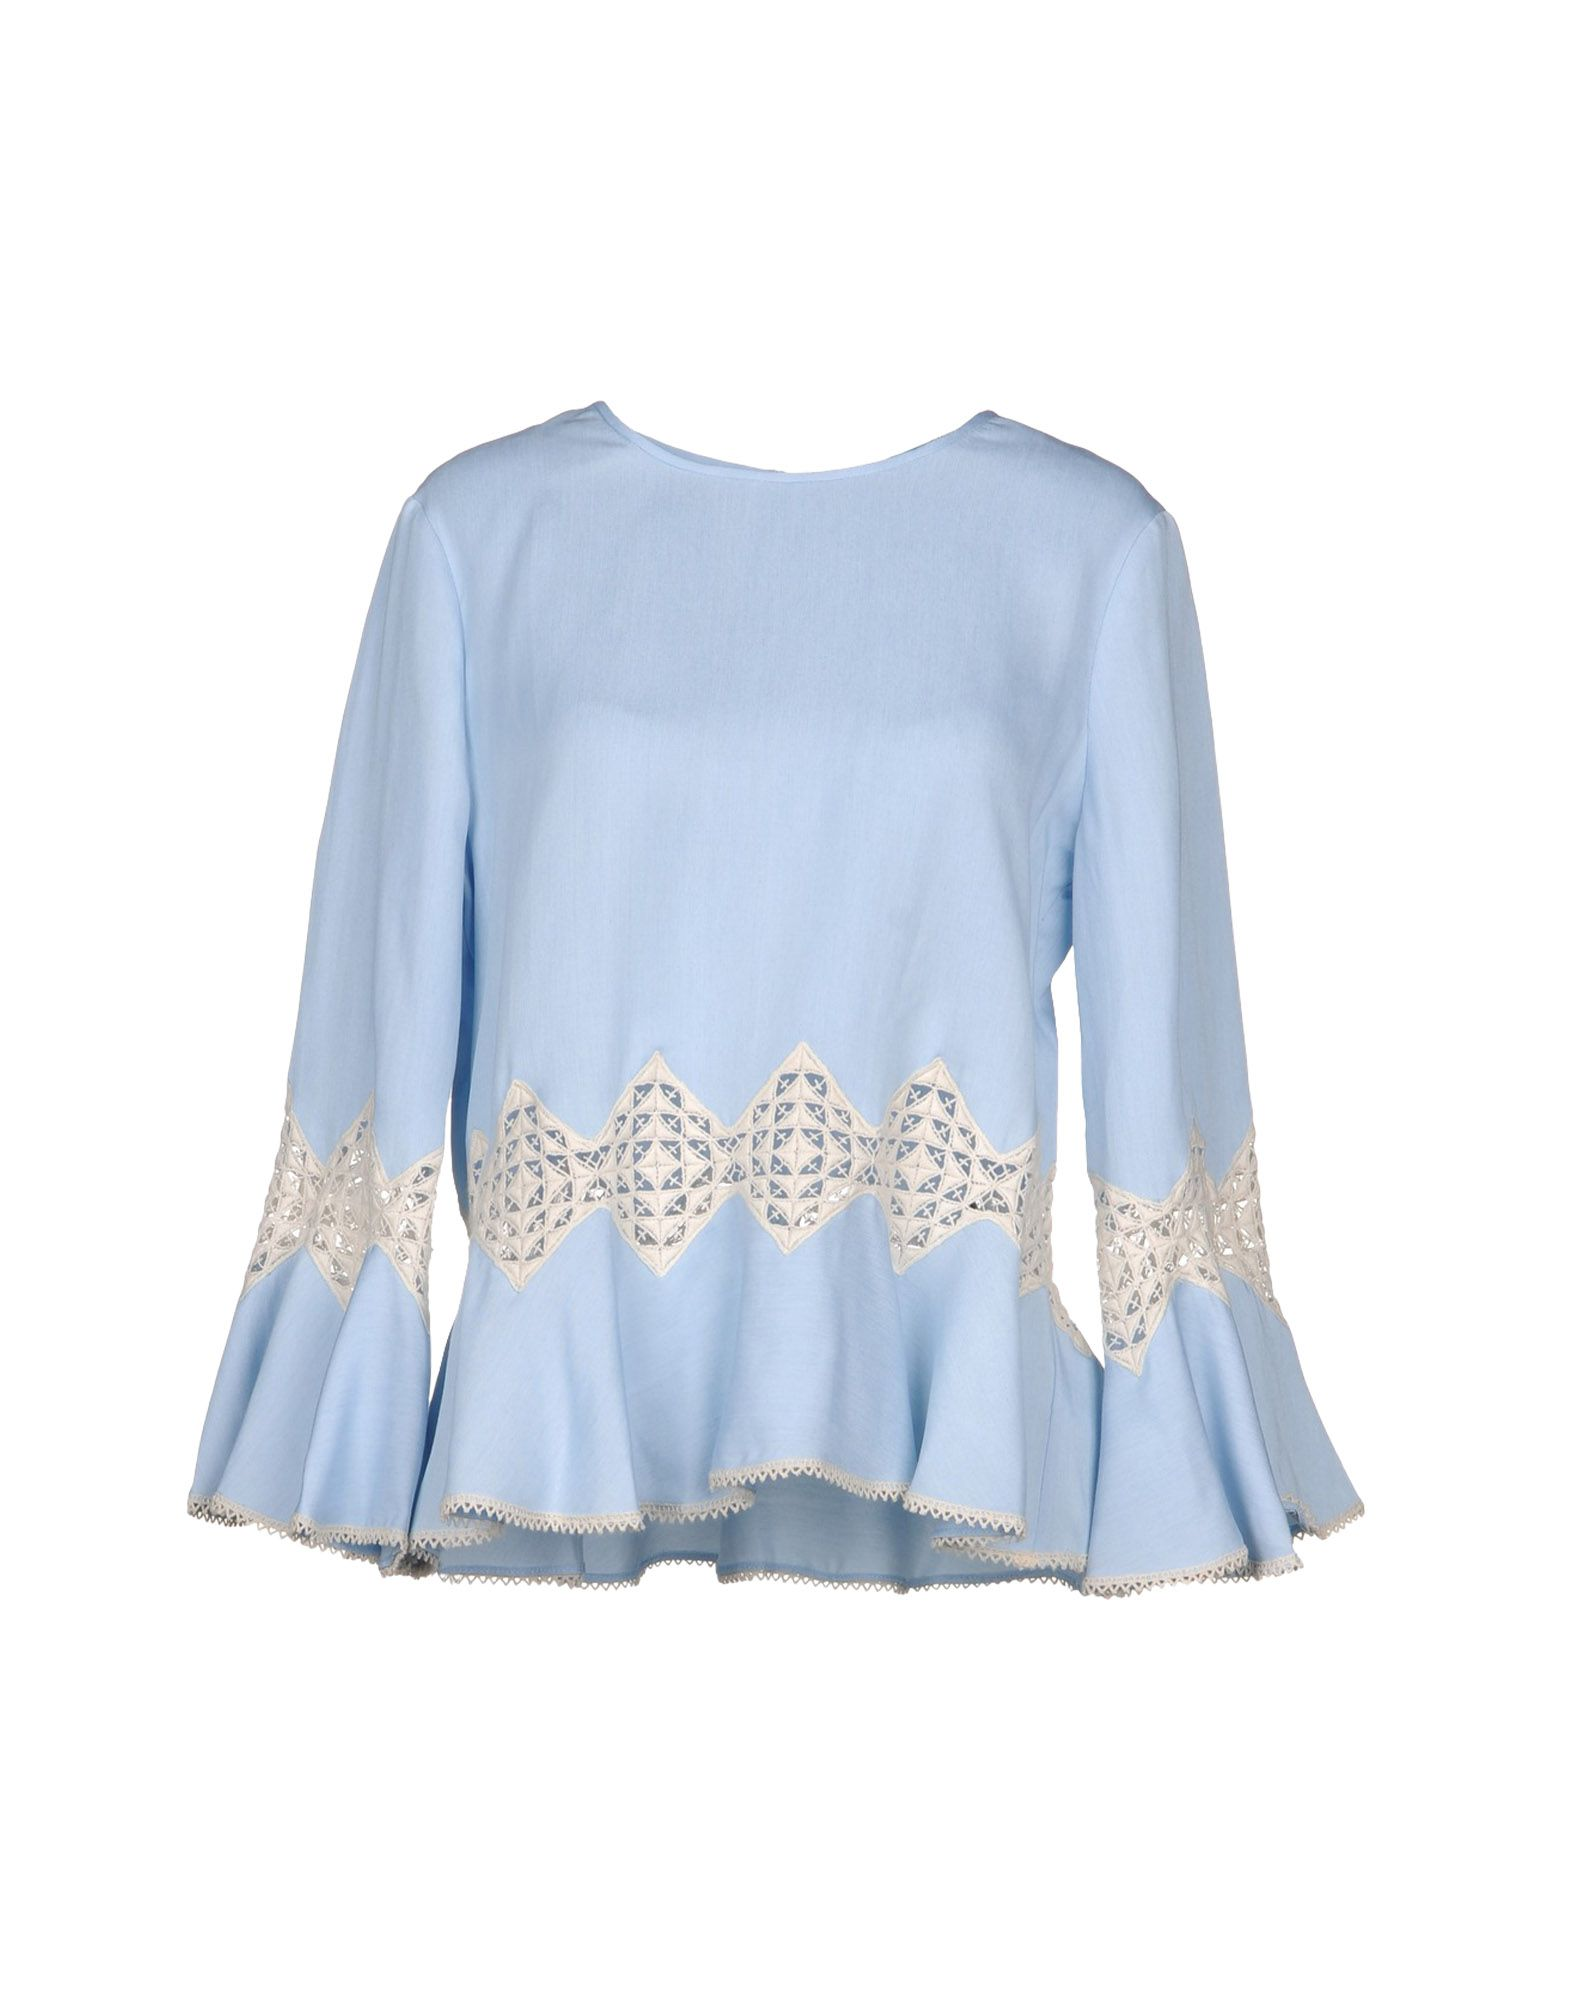 JONATHAN SIMKHAI Блузка jonathan simkhai пиджак